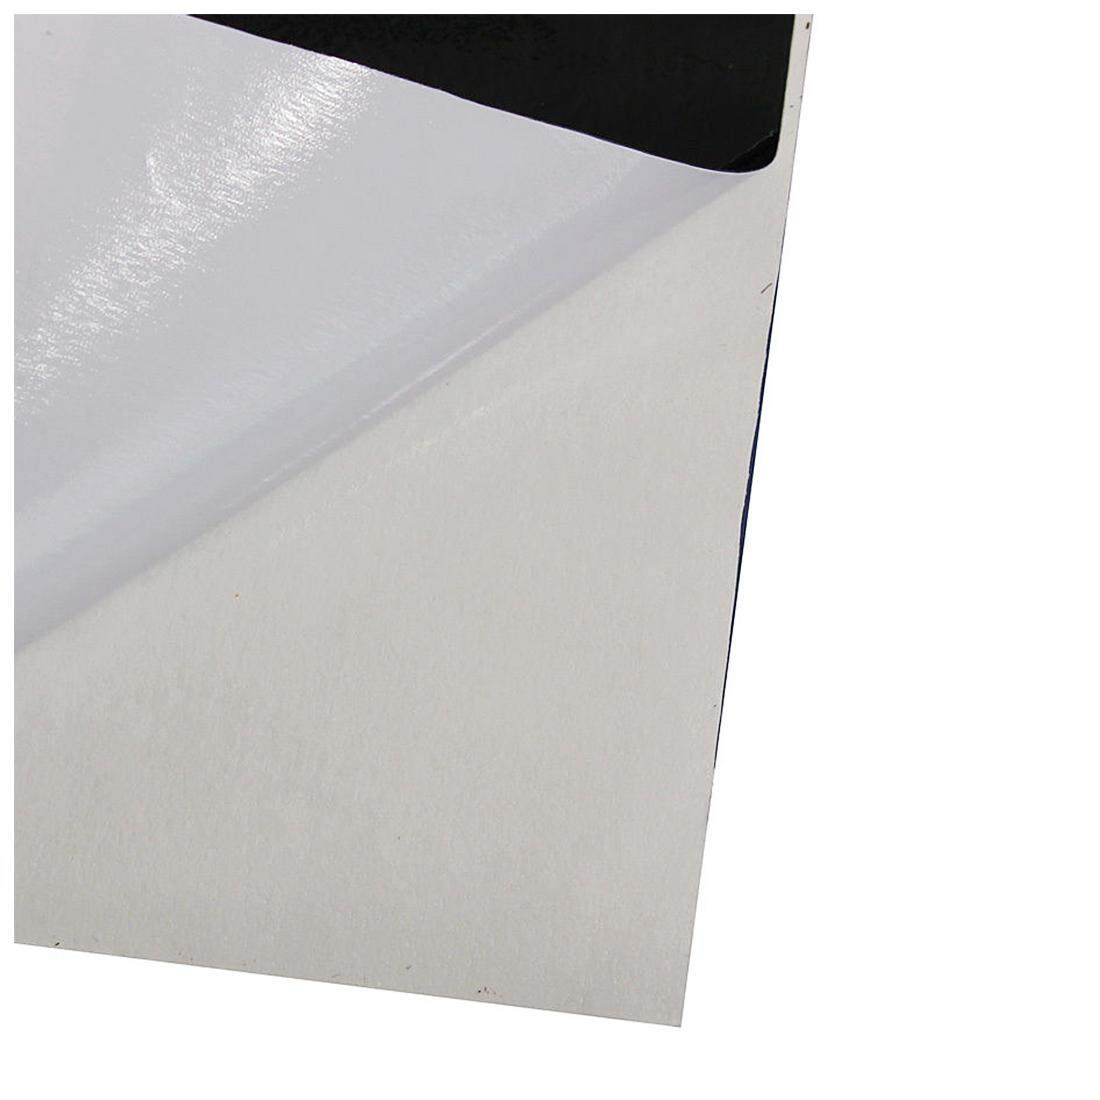 Fitur 2 X Rice Word Flag Side Mirrors Black Decals Vinyl Stickers Frame Photo Gantung Animals Lucu 3 Inch Detail Gambar For Bmw Mini Cooper Intl Terbaru